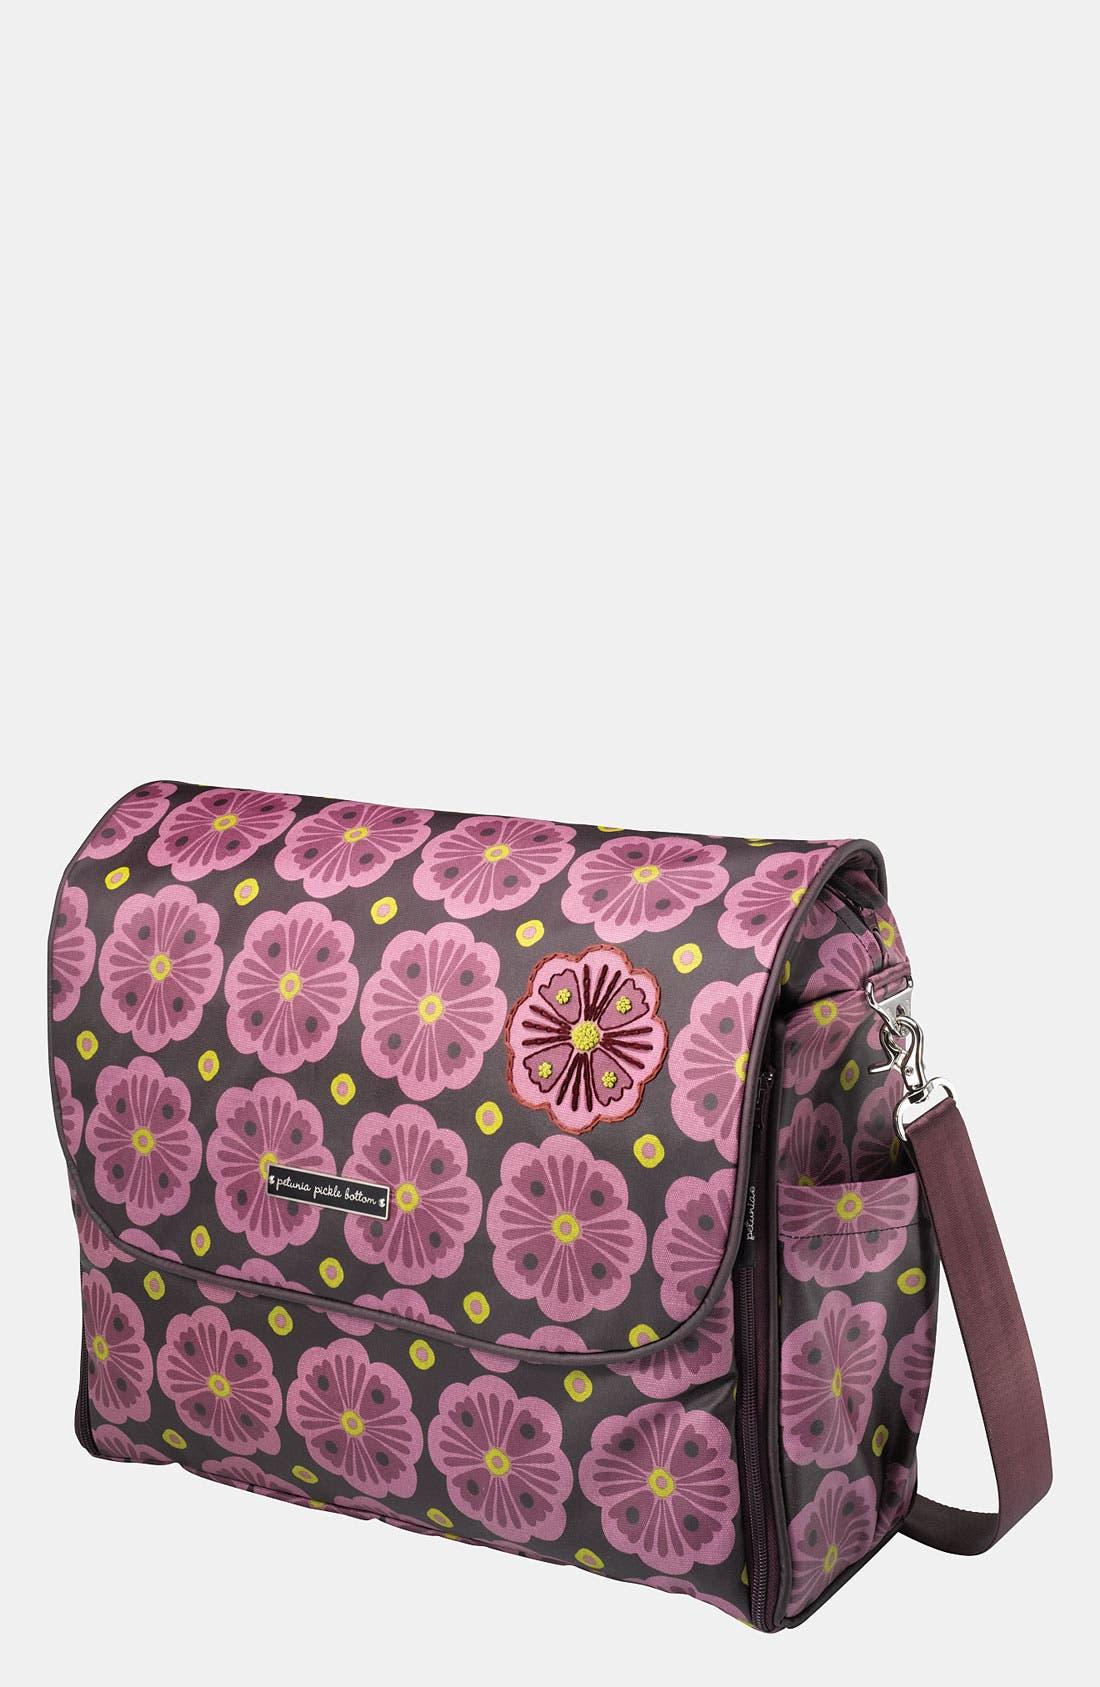 Alternate Image 1 Selected - Petunia Pickle Bottom 'Abundance Boxy' Magnetic Closure Diaper Bag